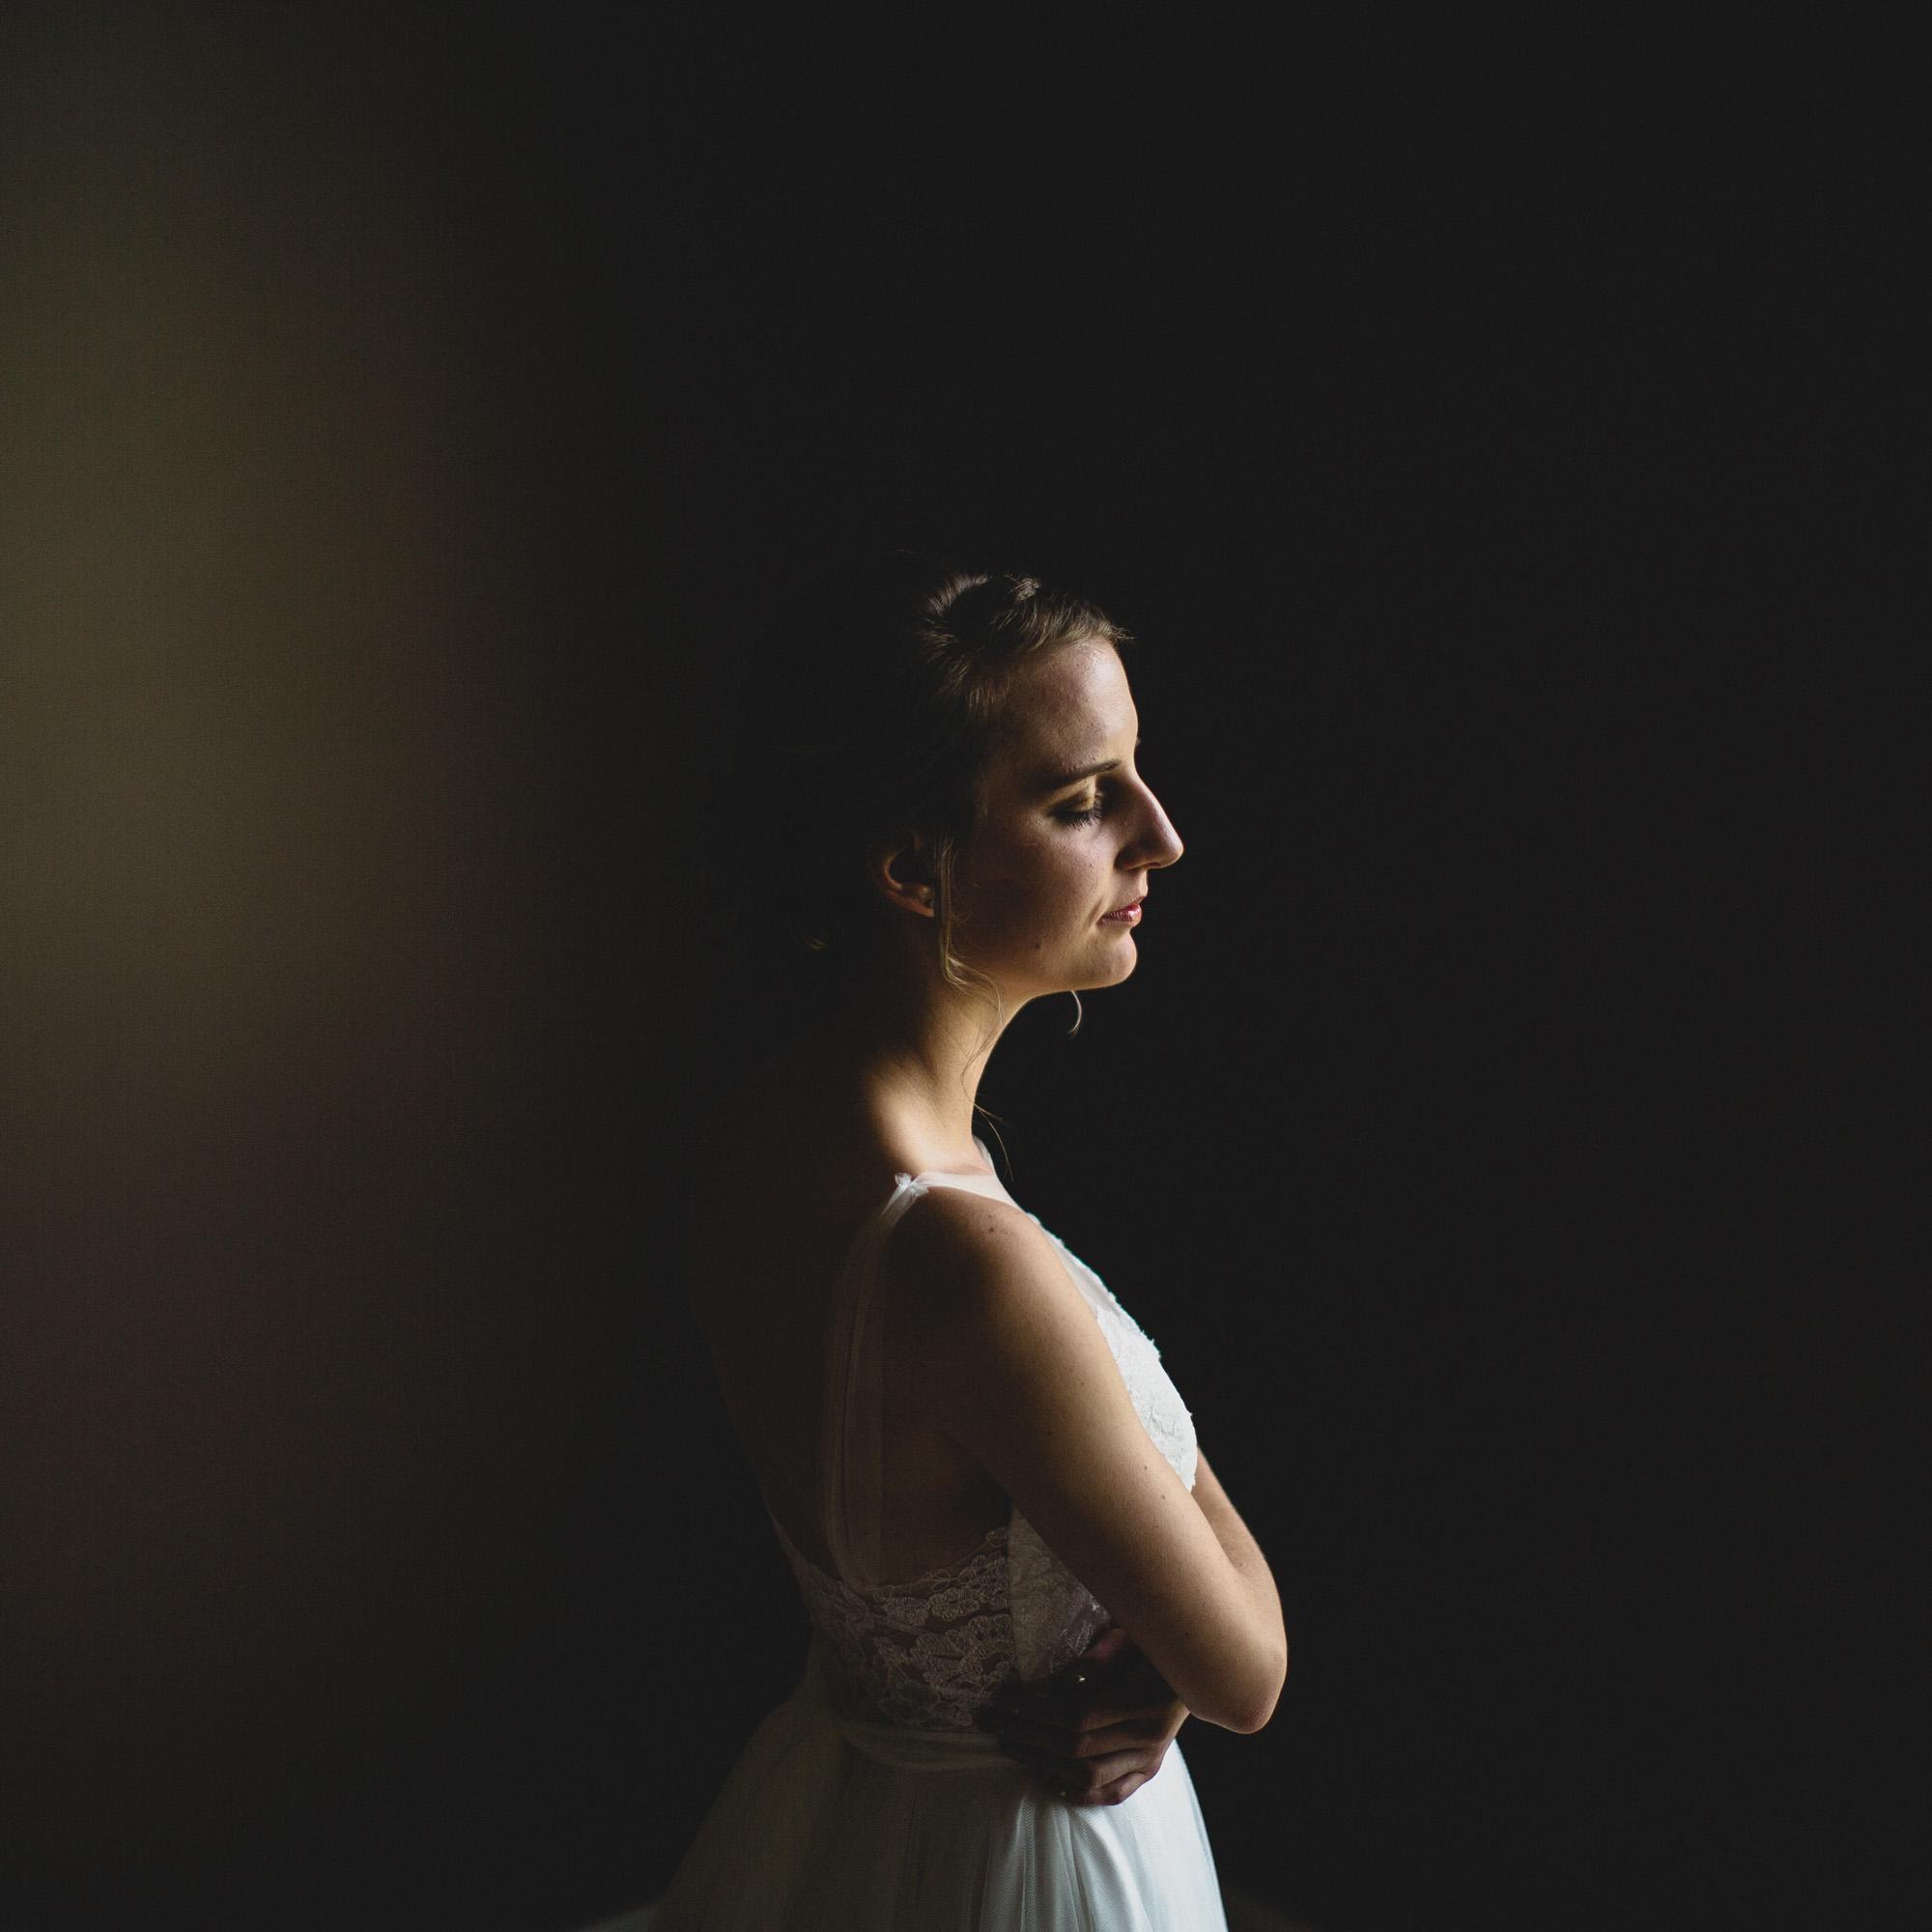 alec_vanderboom_springfield_missouri_wedding-0038.jpg